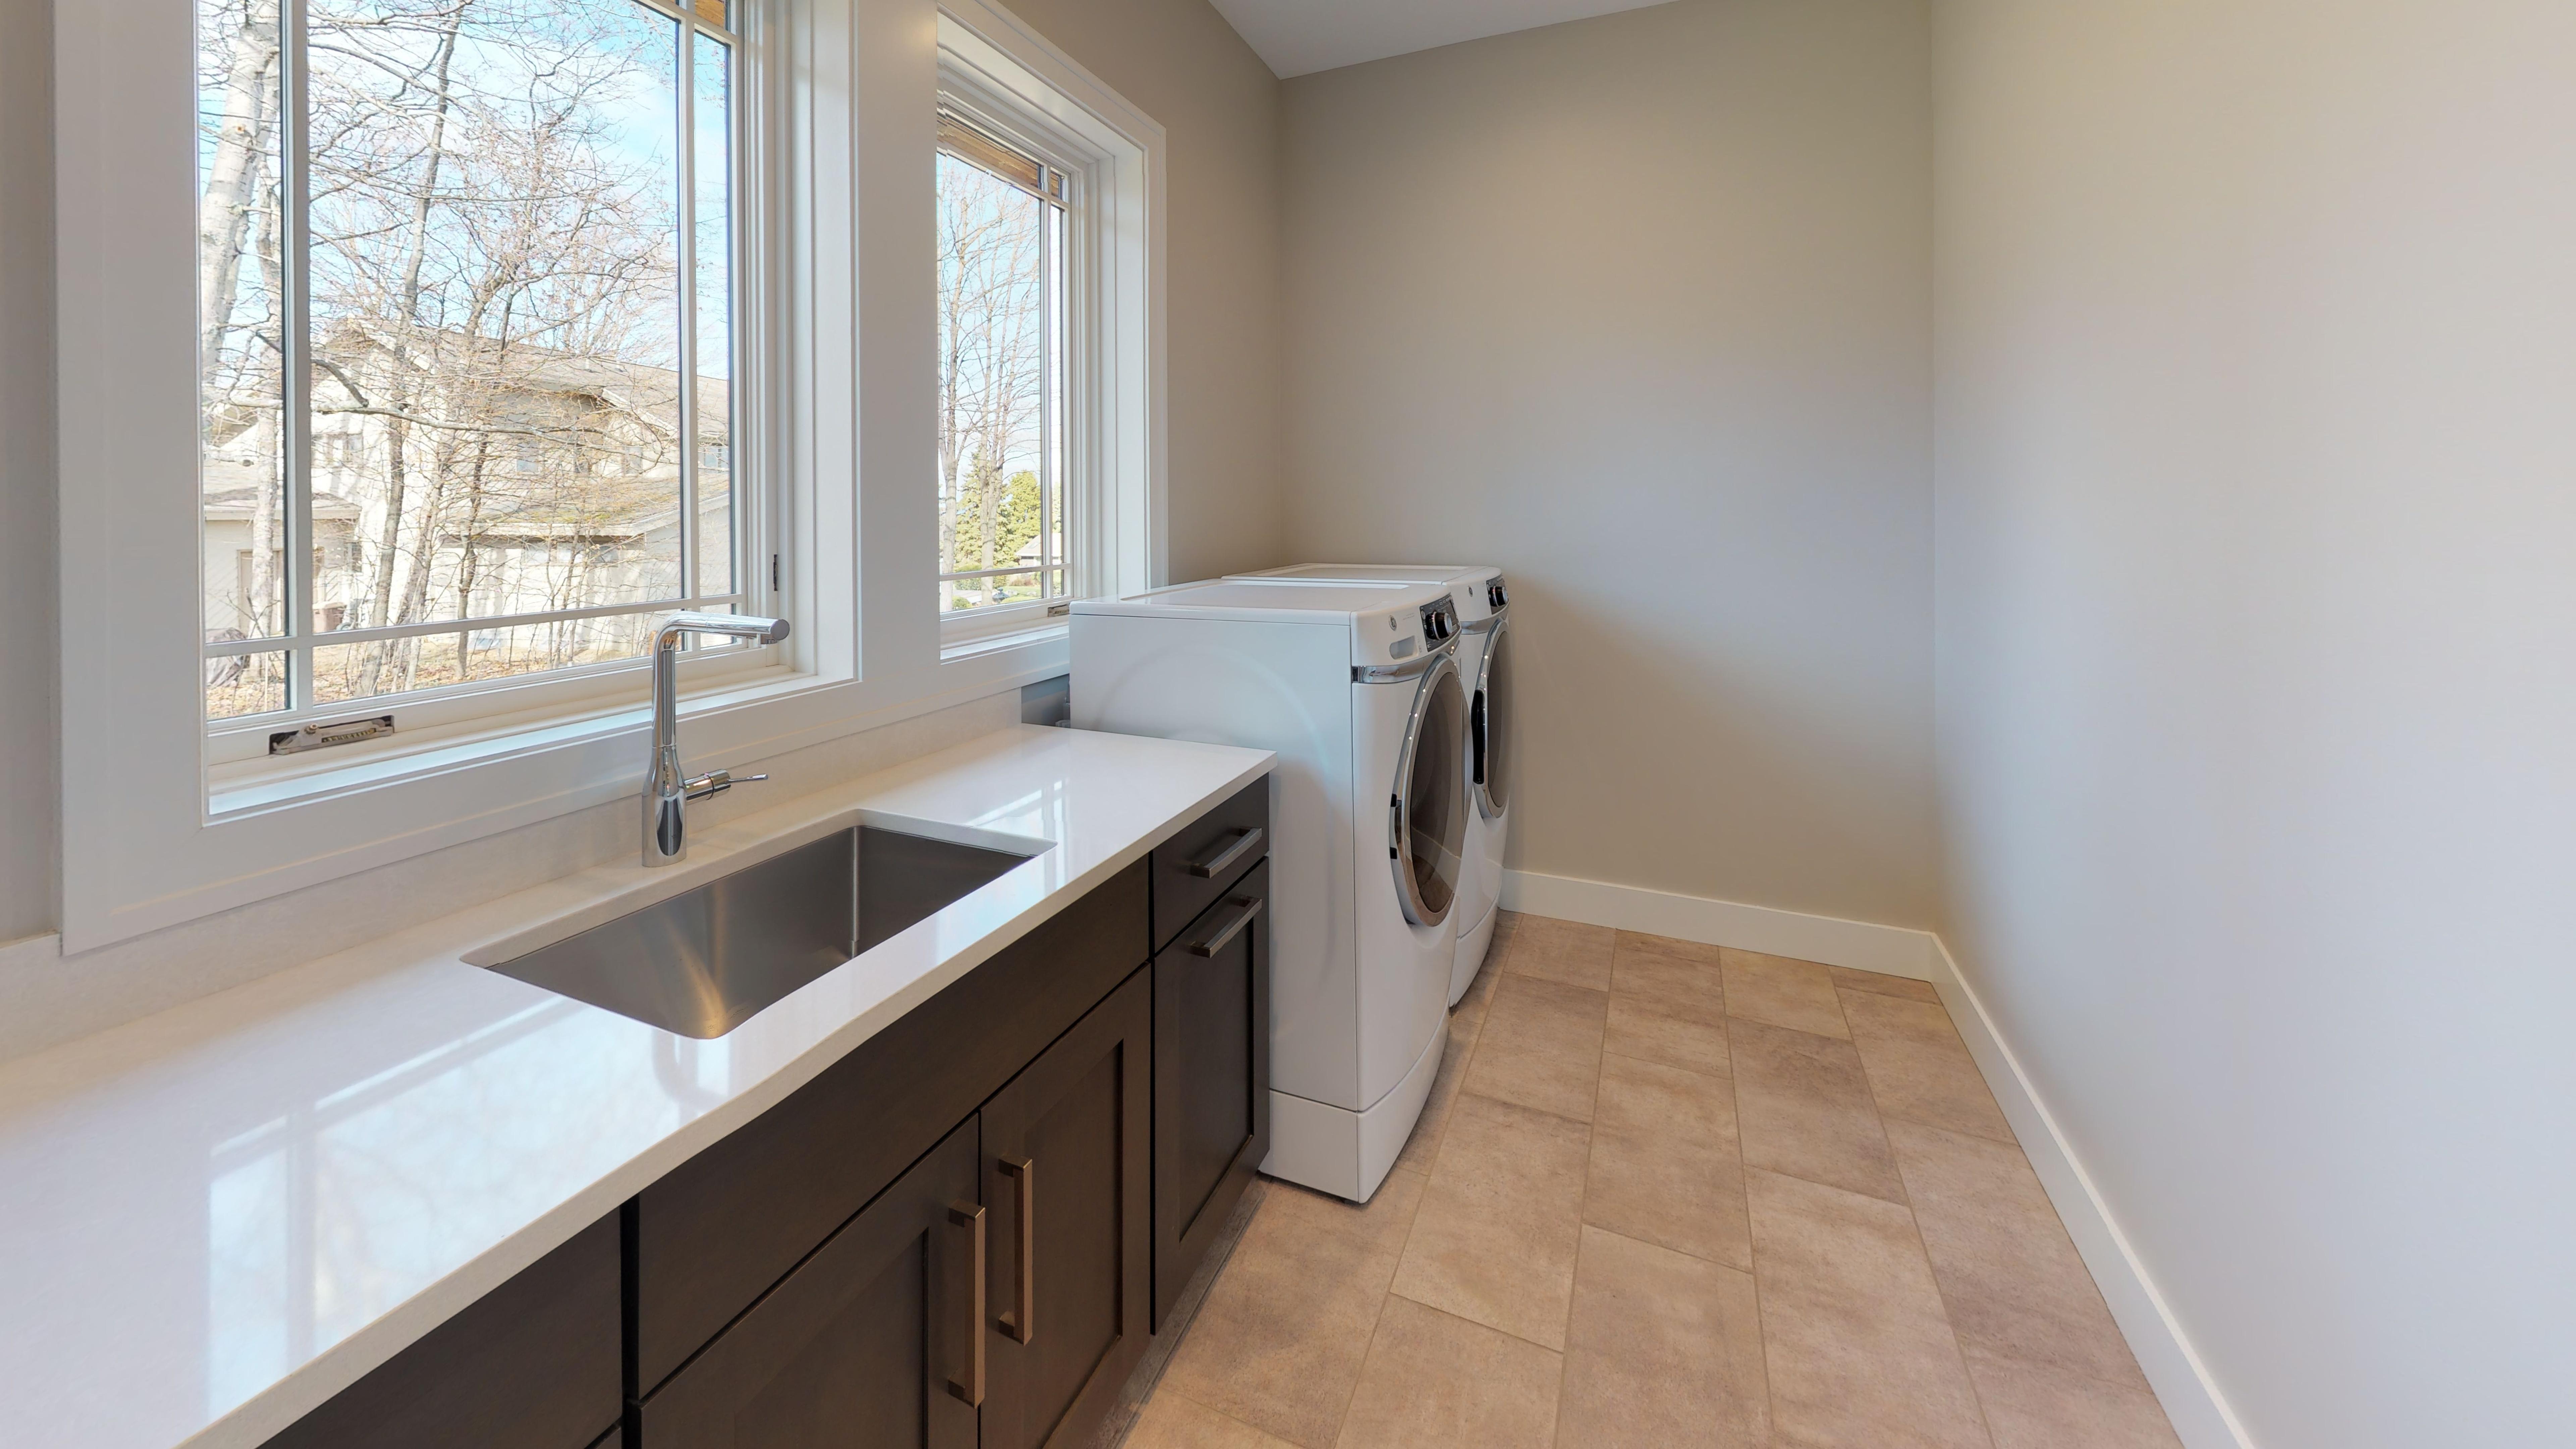 385-Chestnut-Ridge-Laundry.jpg